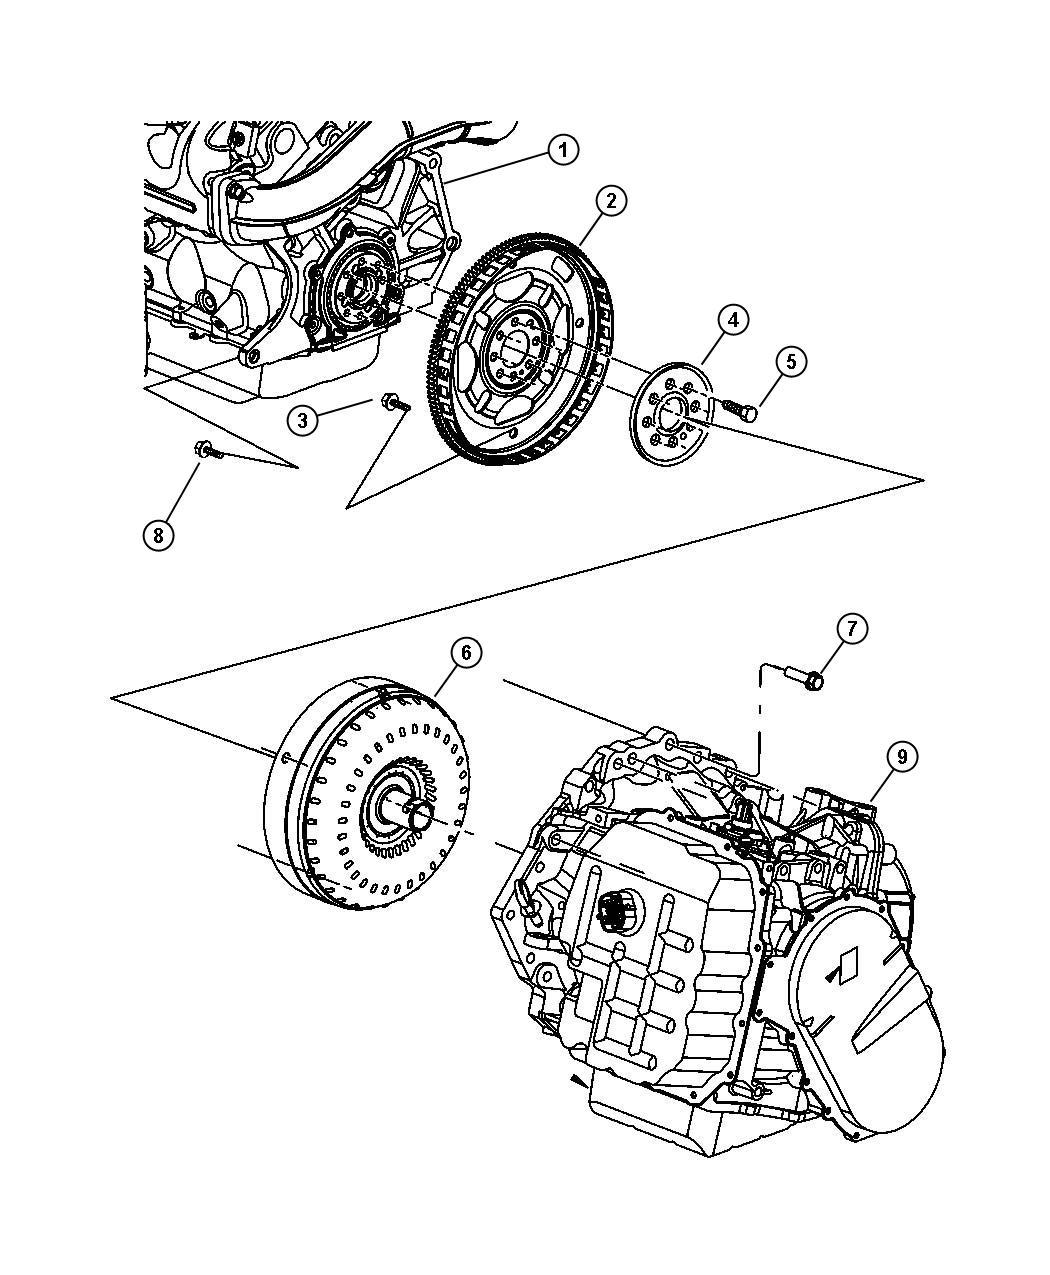 2007 chrysler pacifica transmission mount